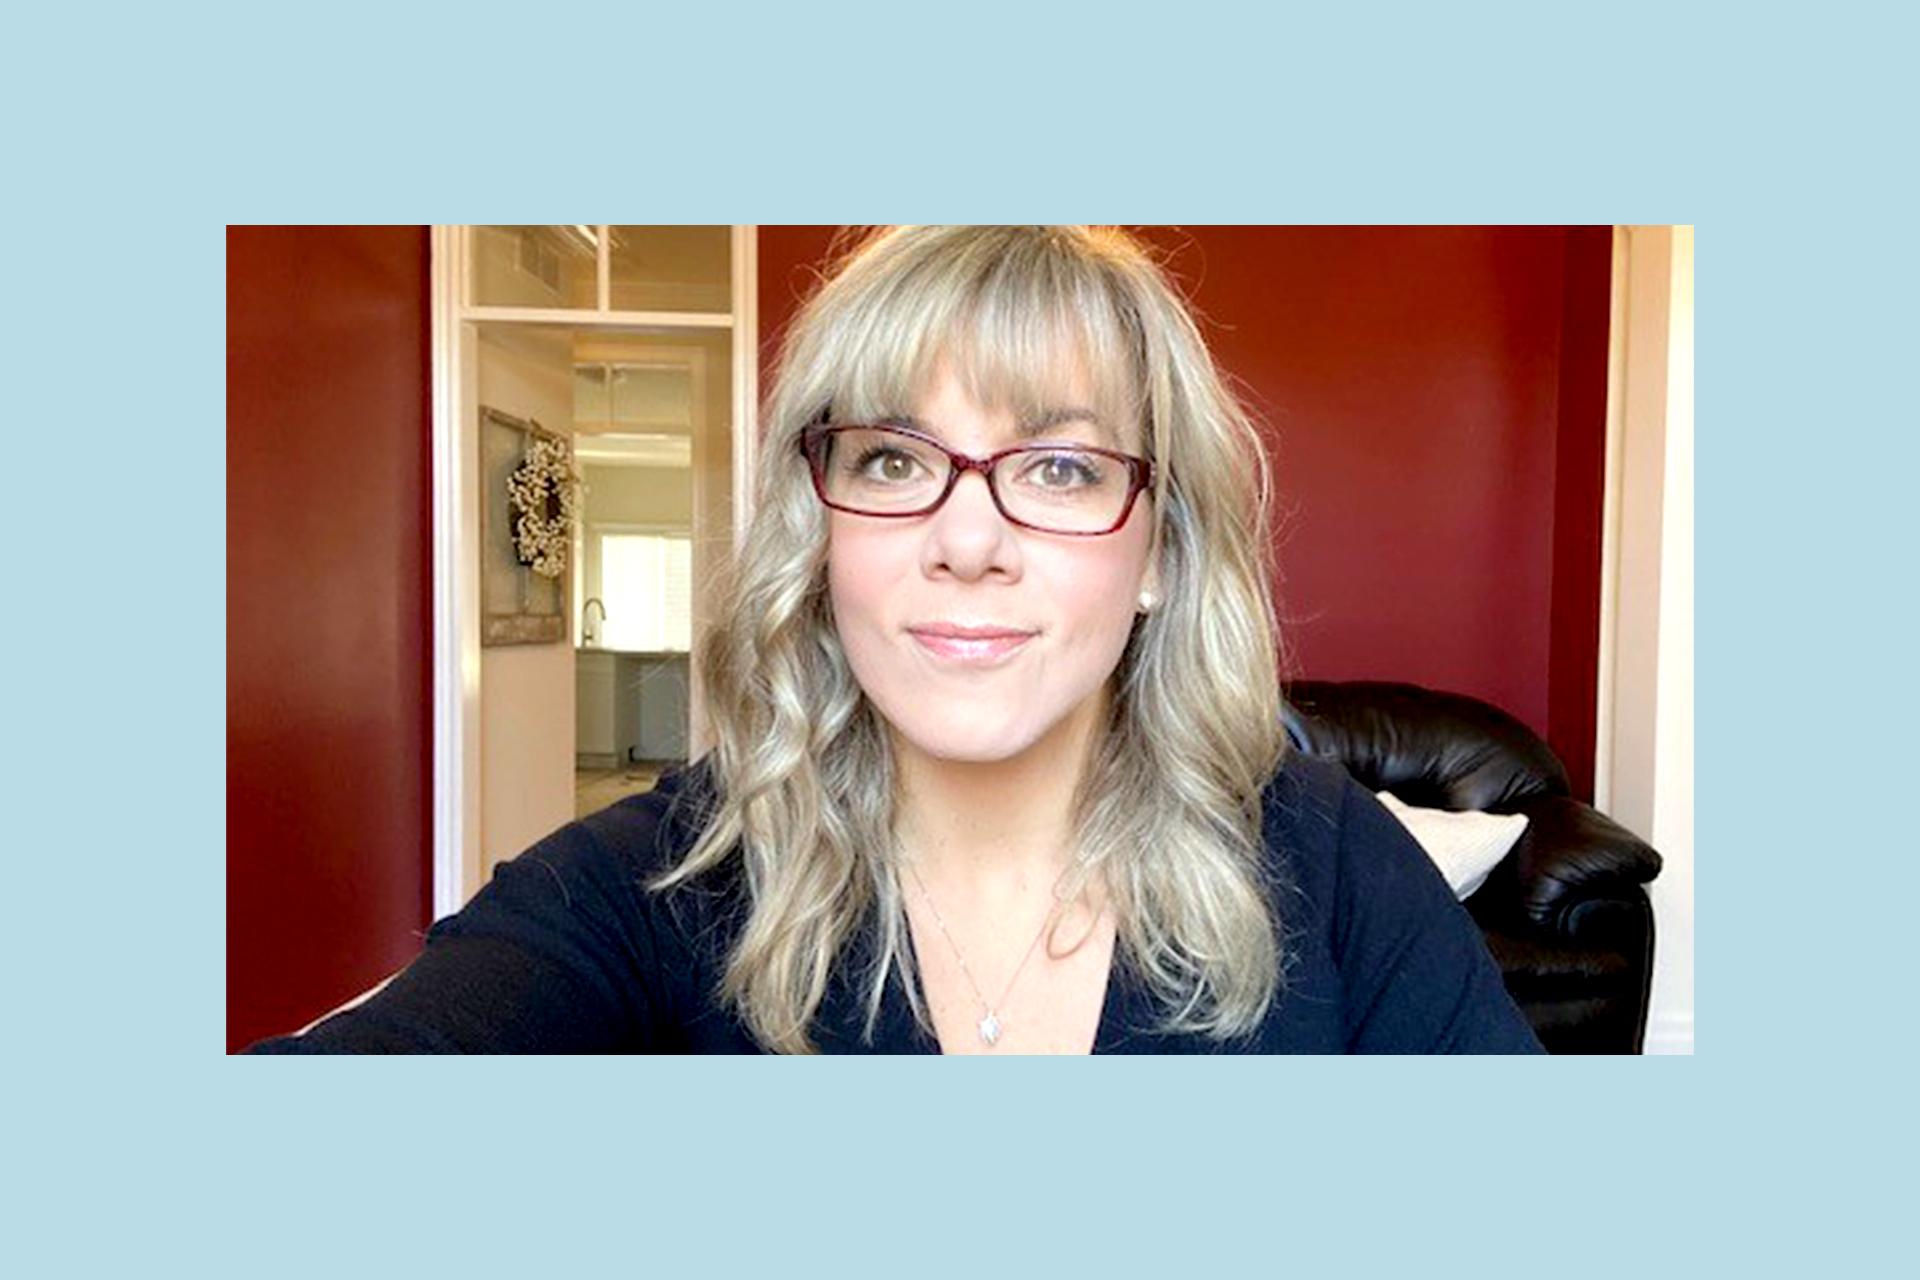 Misty profile photo